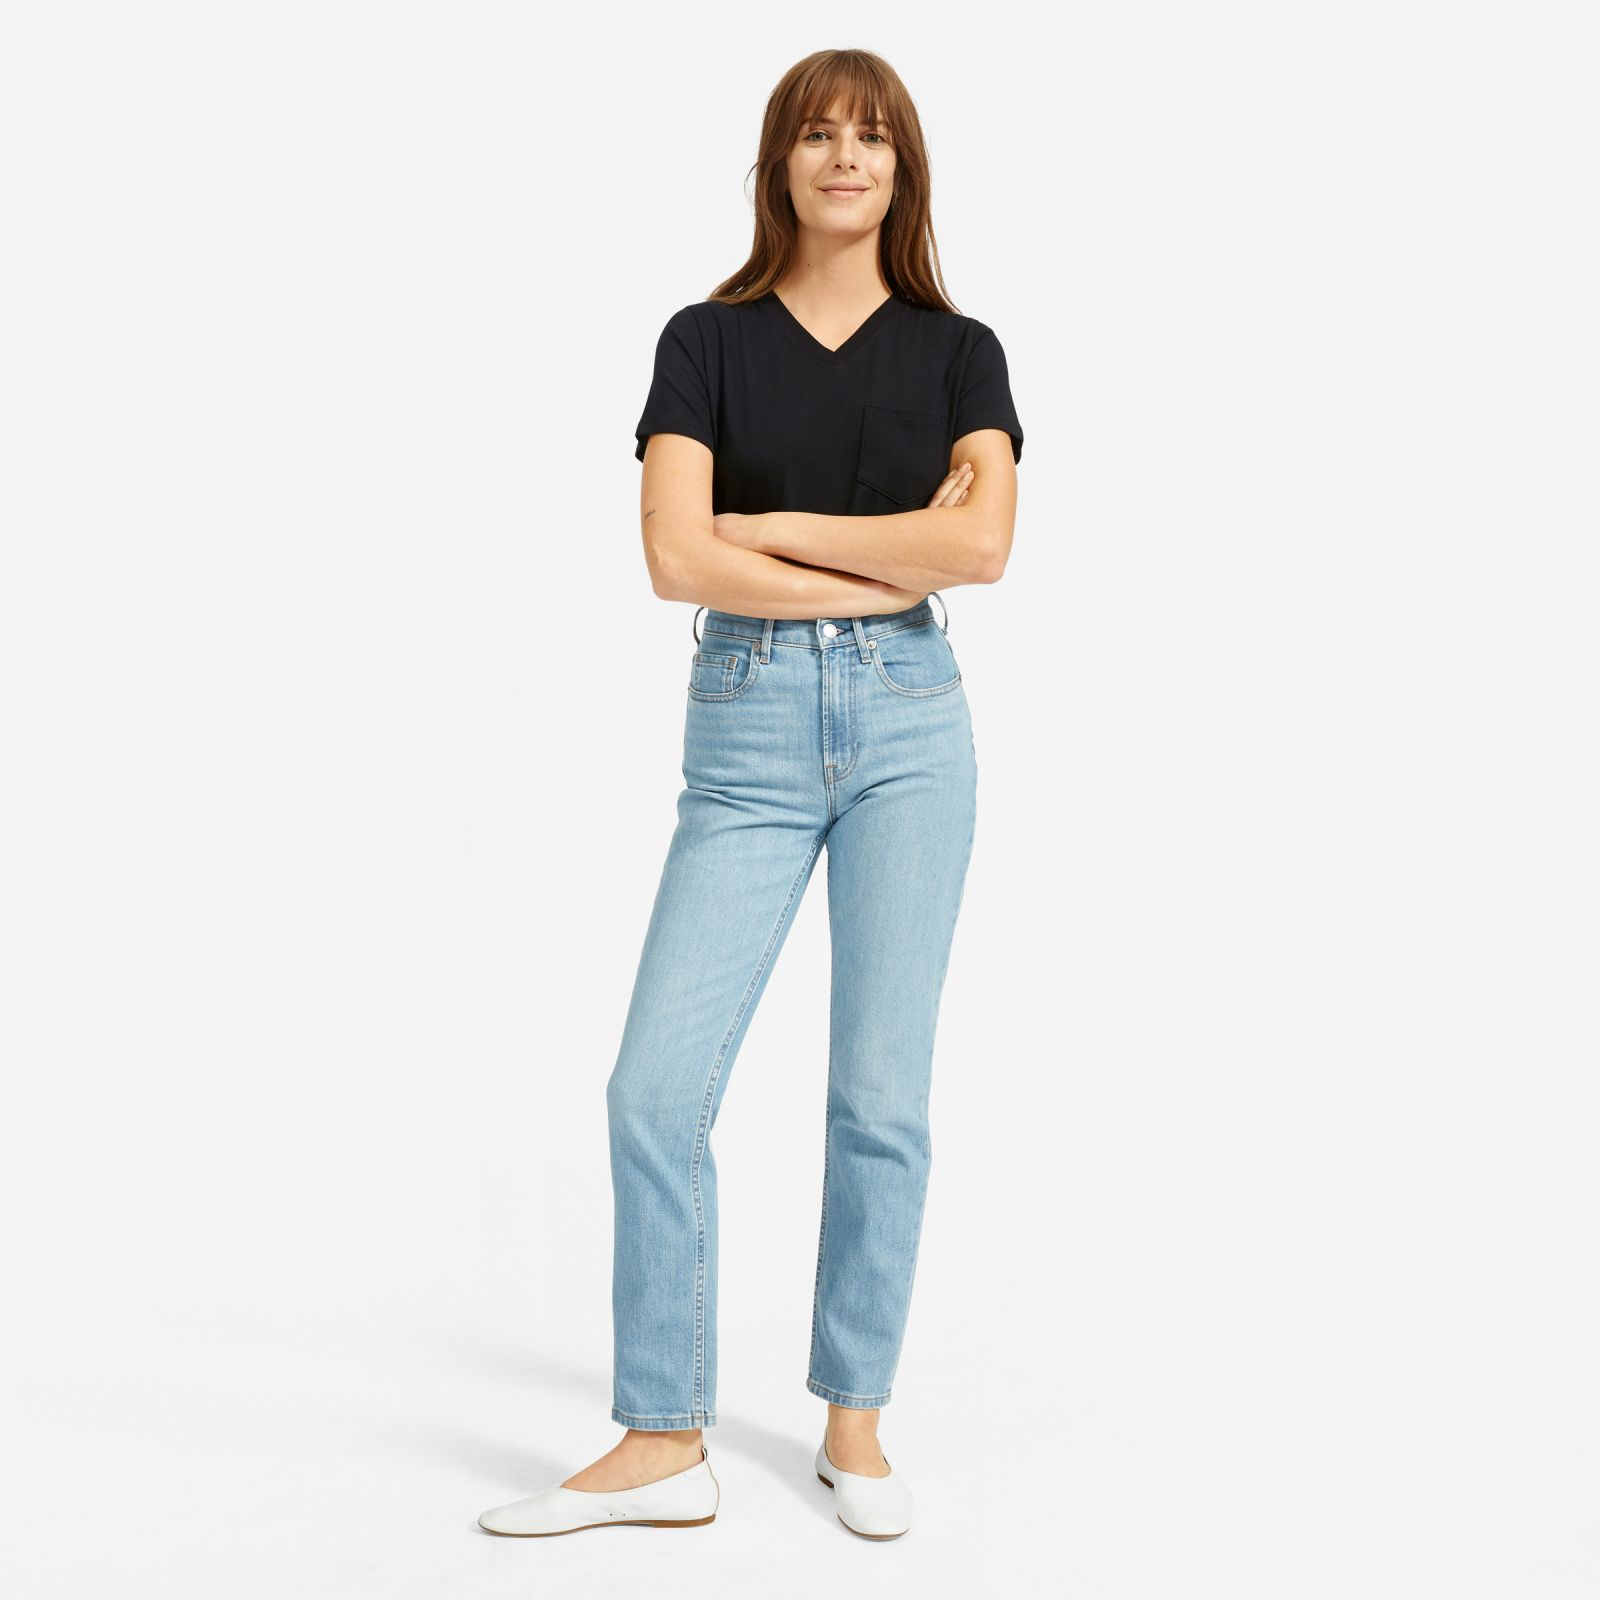 women's cotton box-cut v-neck t-shirt by everlane in black, size xl